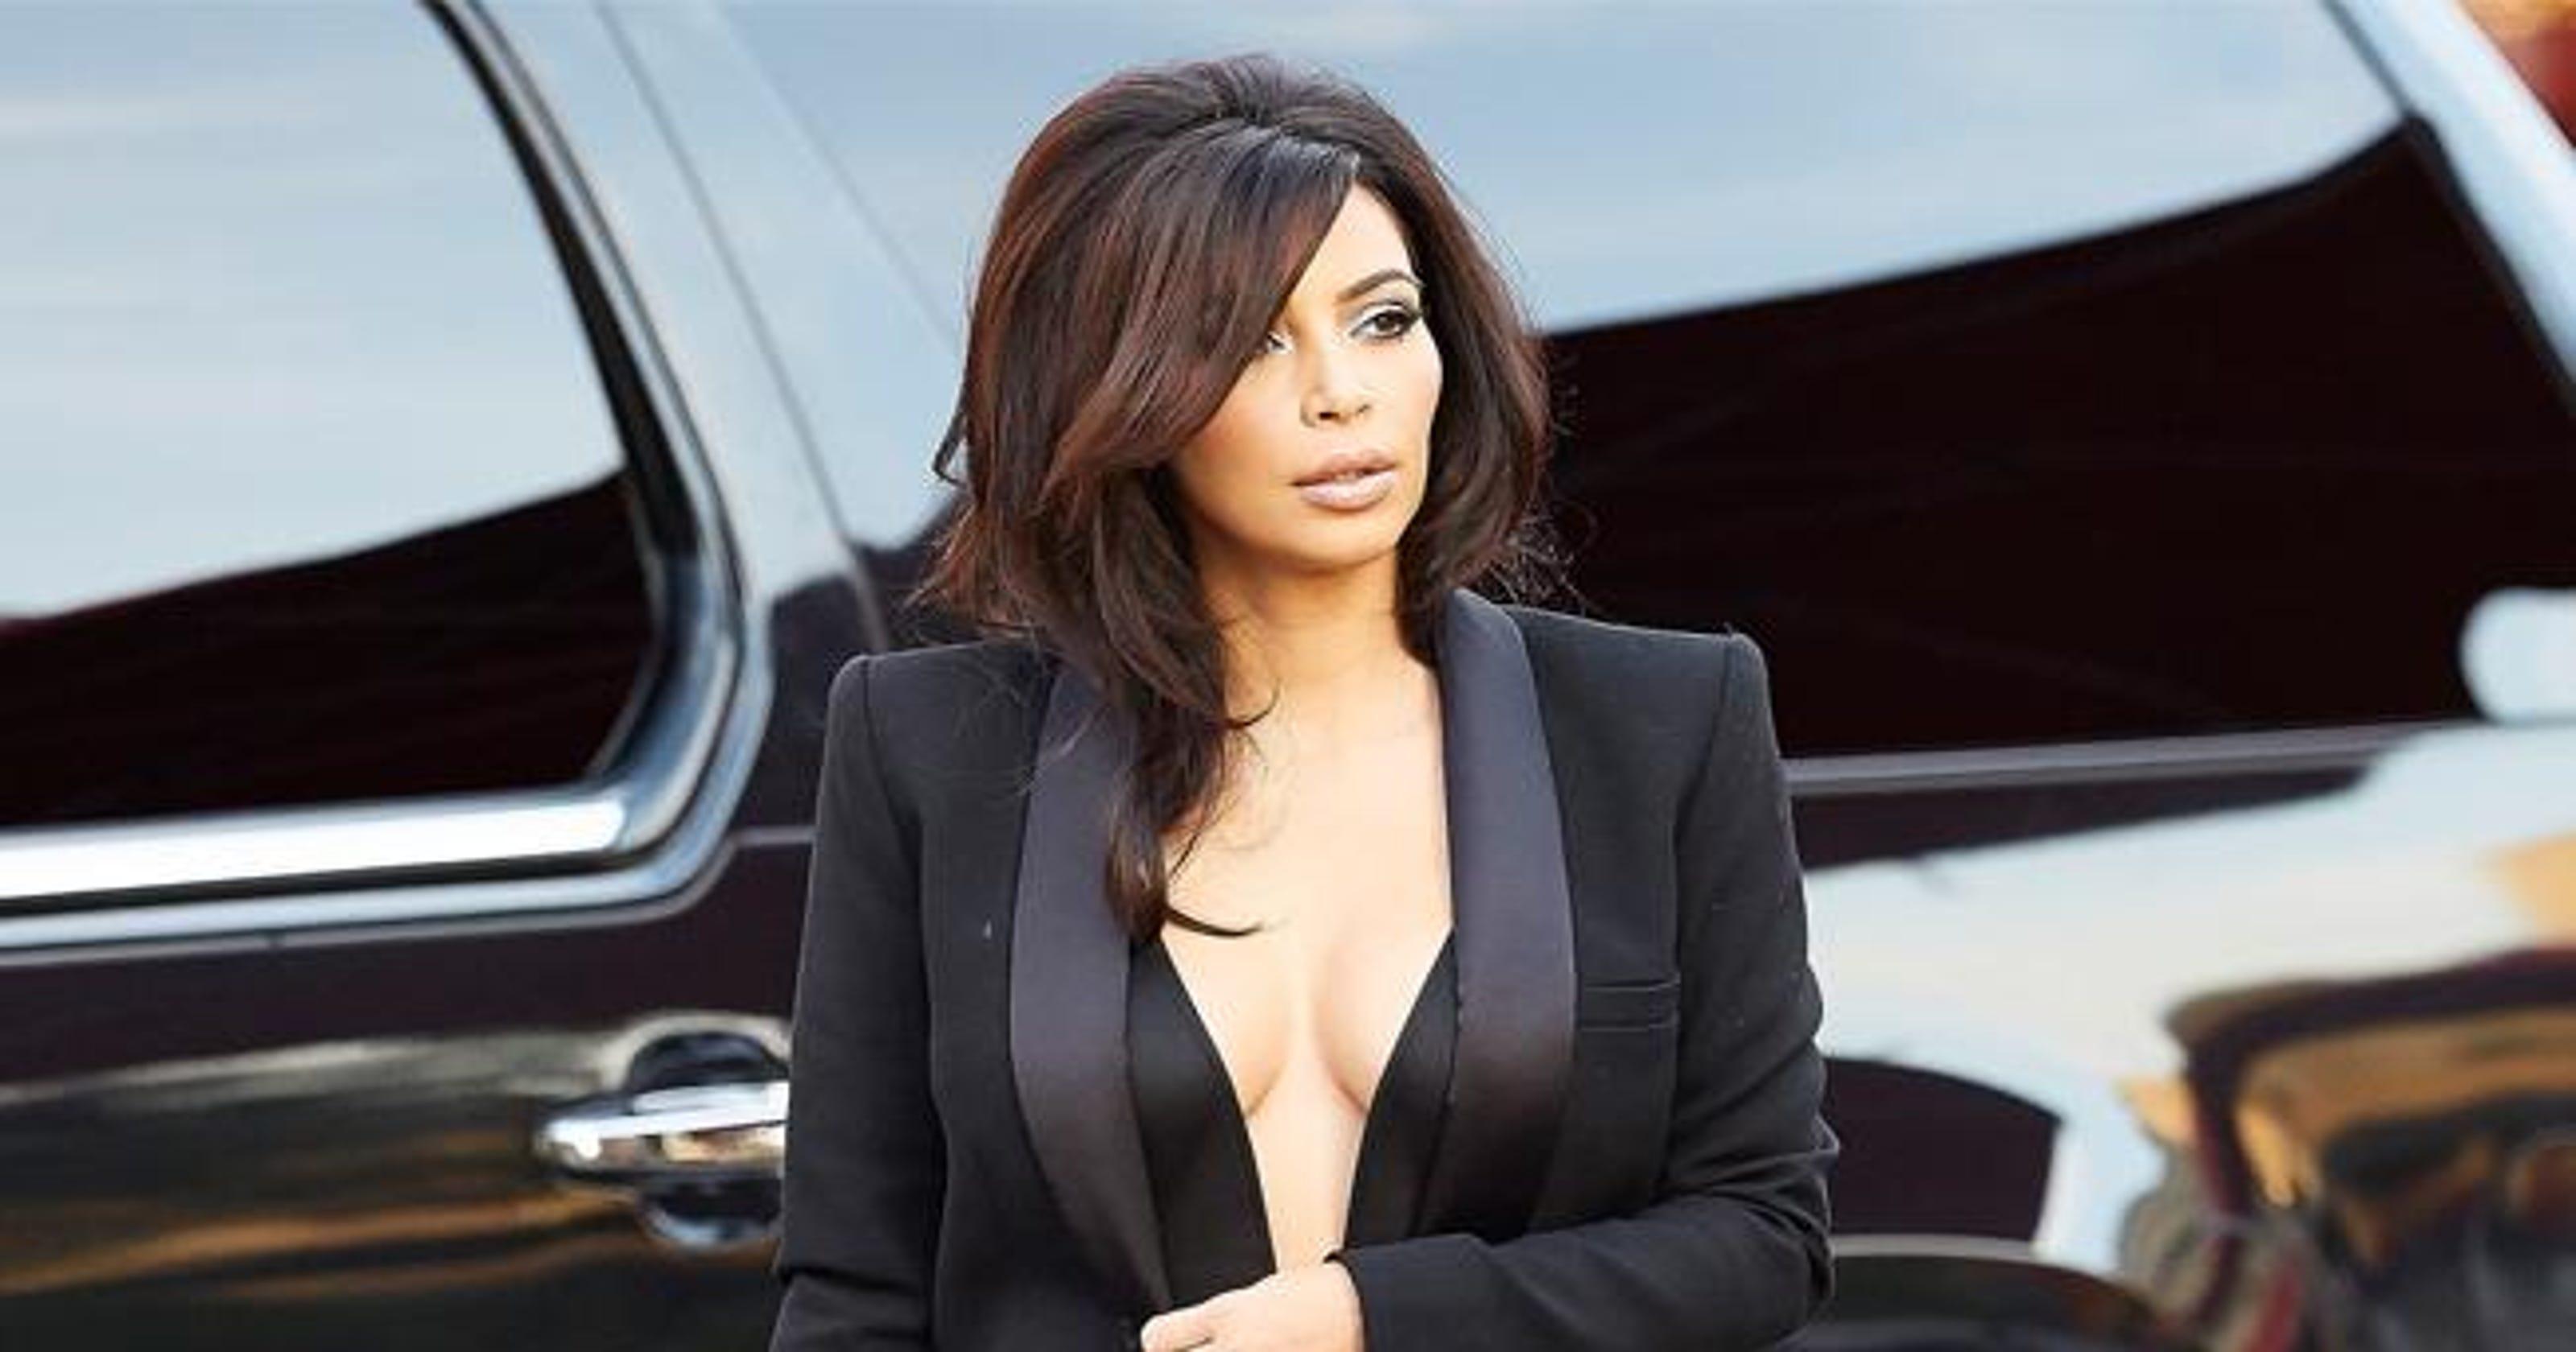 fcf97cde2 Kim Kardashian's assistant crashes her $300K car?